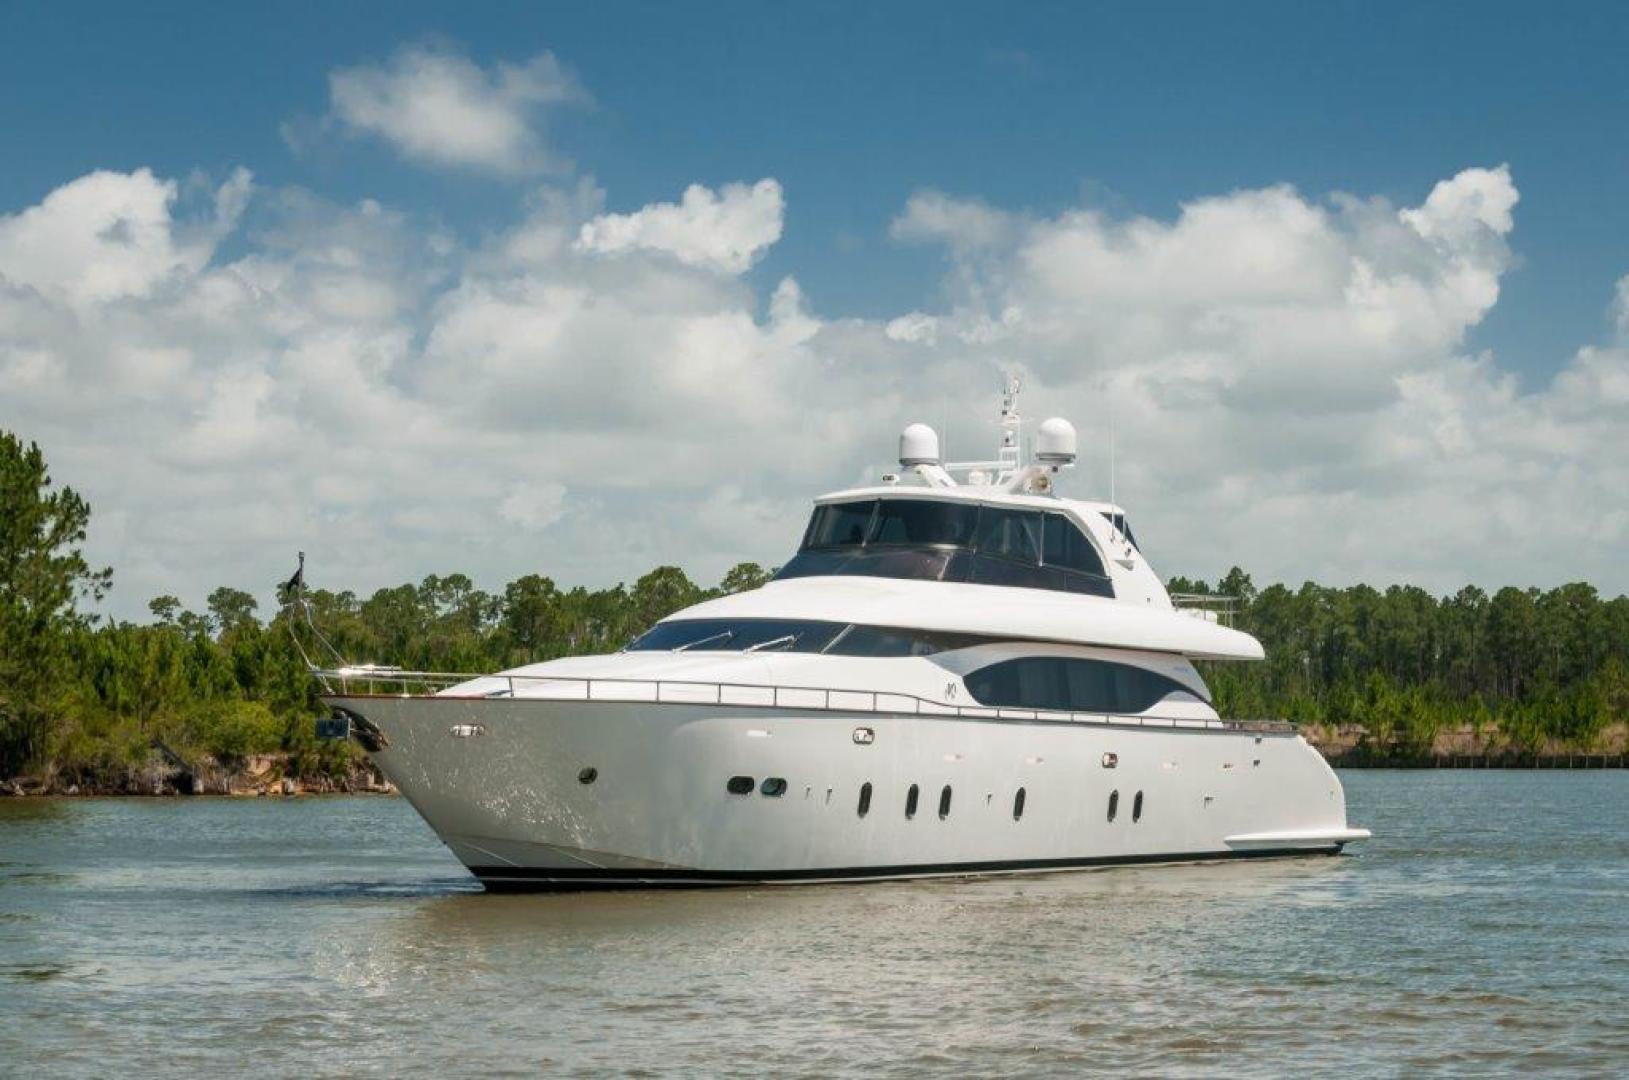 Maiora-84 Motor Yacht 2015-Never Rest SANDESTIN-Florida-United States-2015 Maiora 84 Motor Yacht Never Rest Port Profile-720528 | Thumbnail